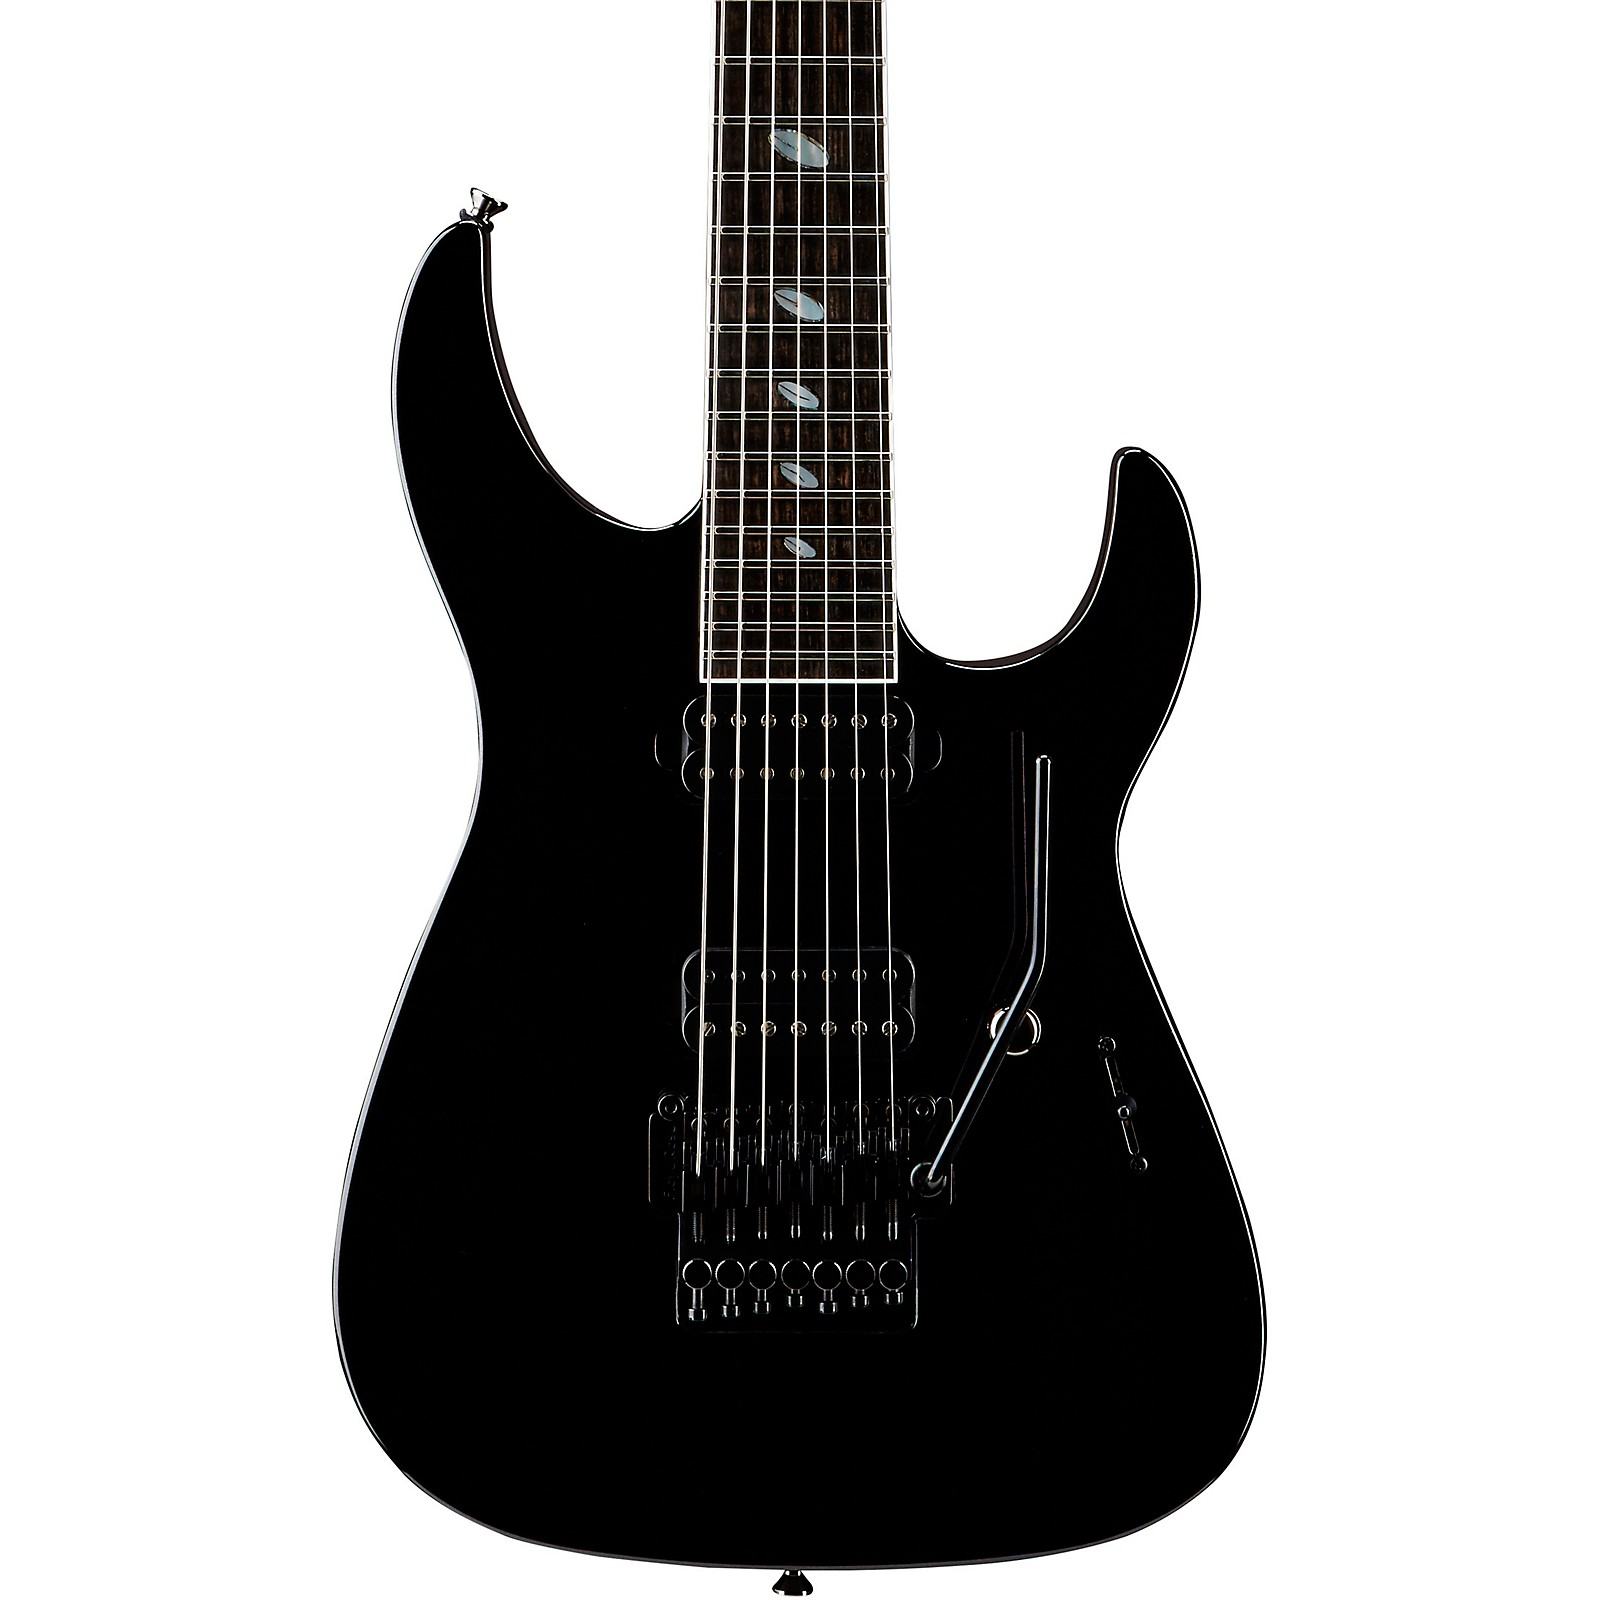 Caparison Guitars Dellinger 7 Prominence Electric Guitar